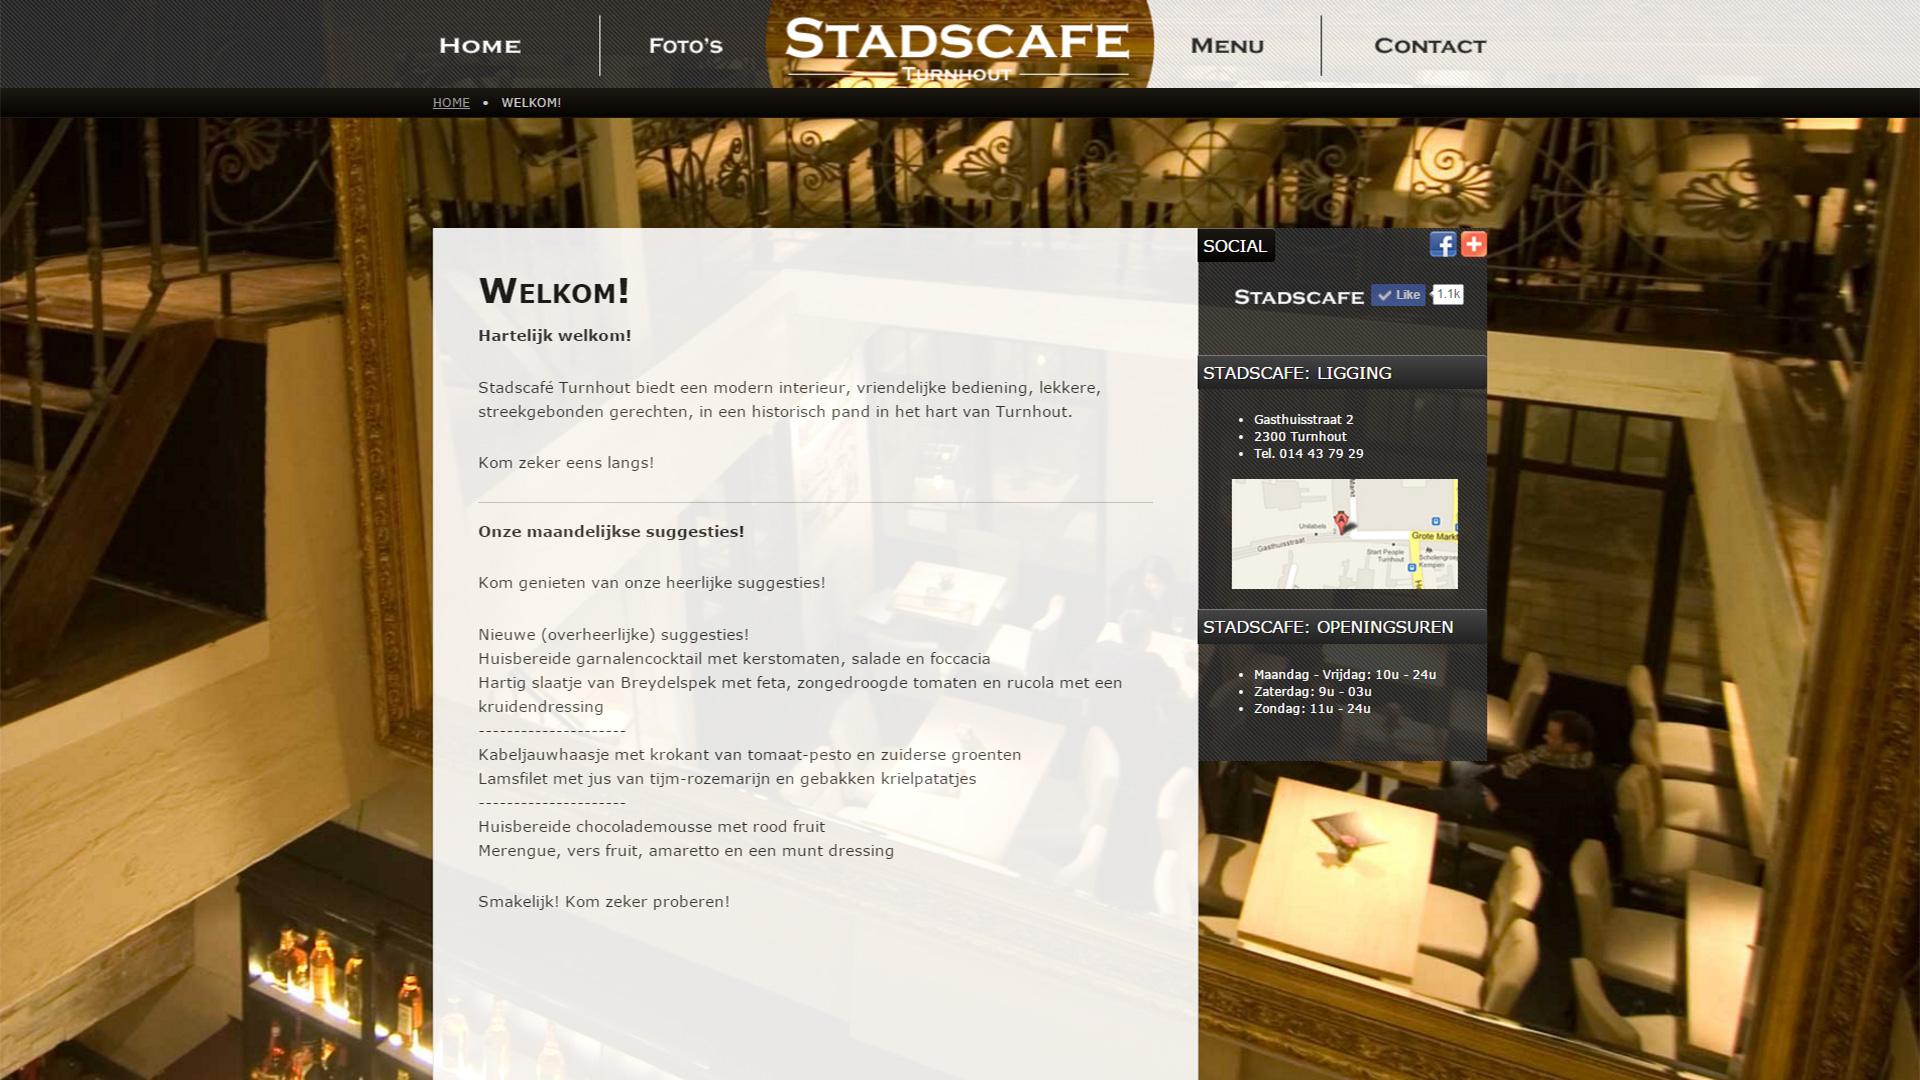 Stadscafe Turnhout 2013